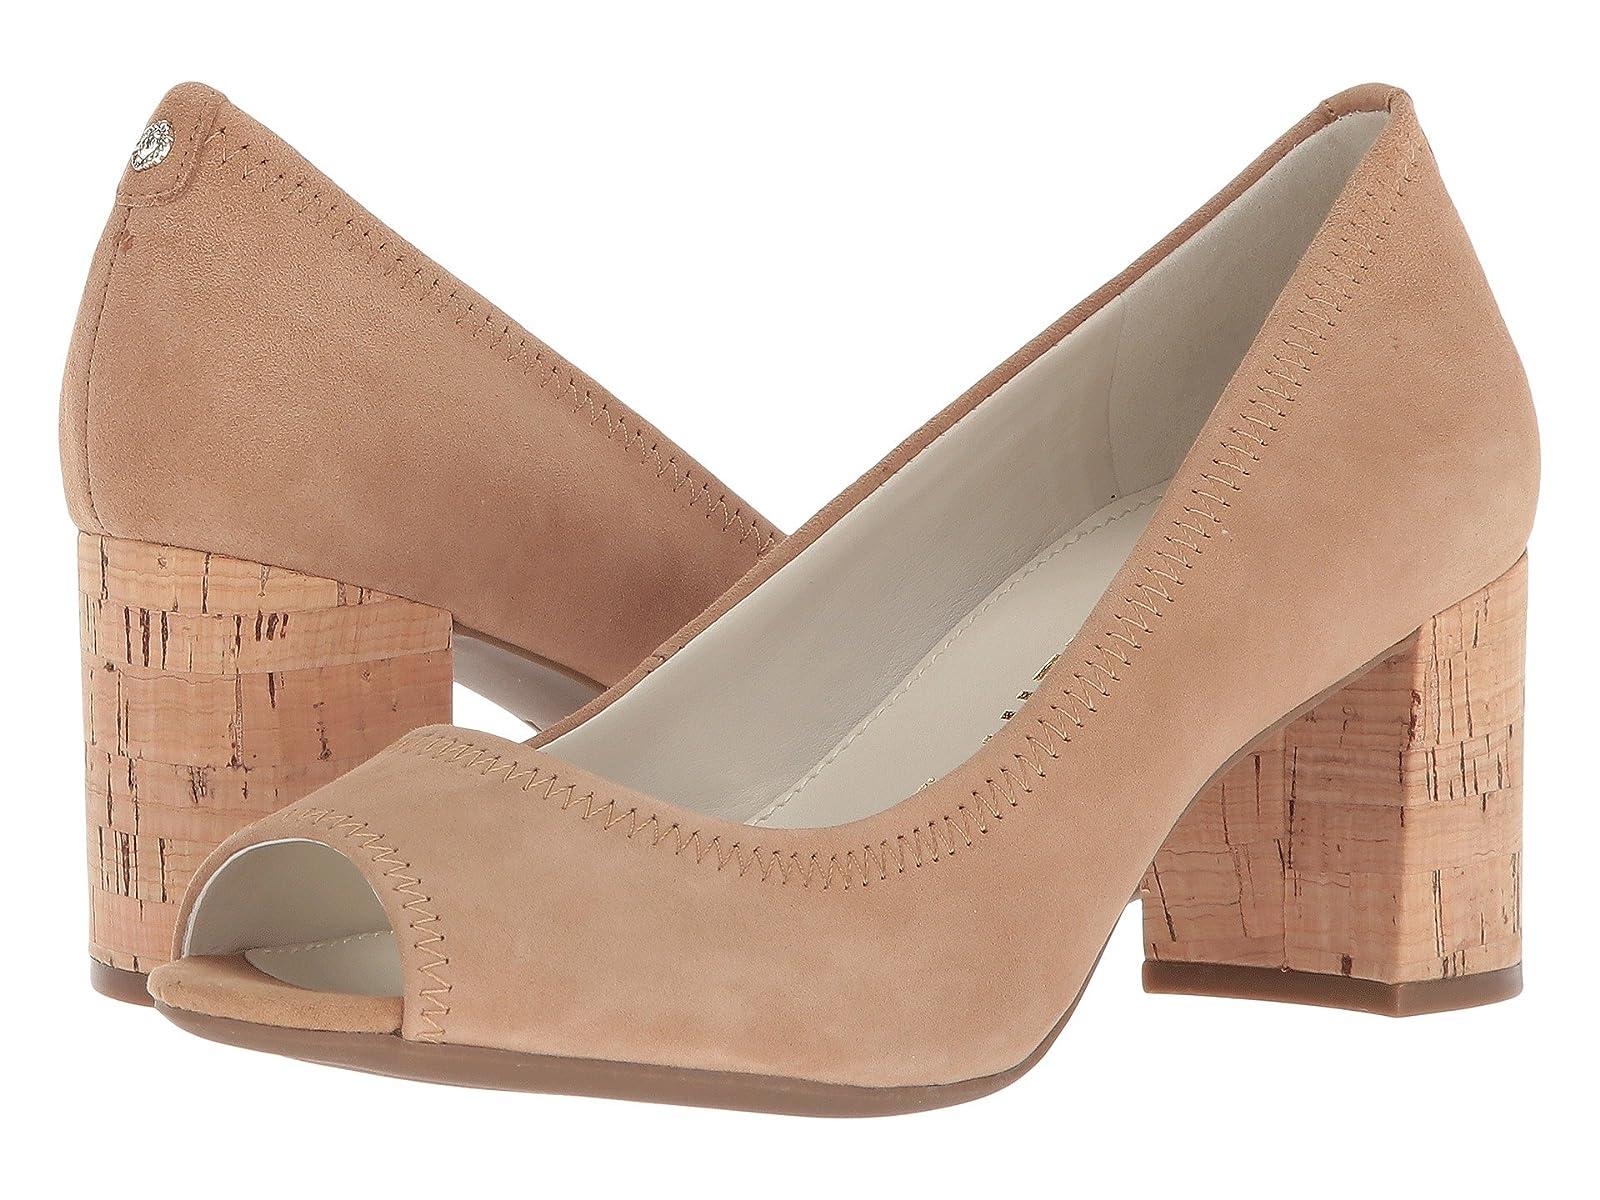 Anne Klein MeredithAtmospheric grades have affordable shoes